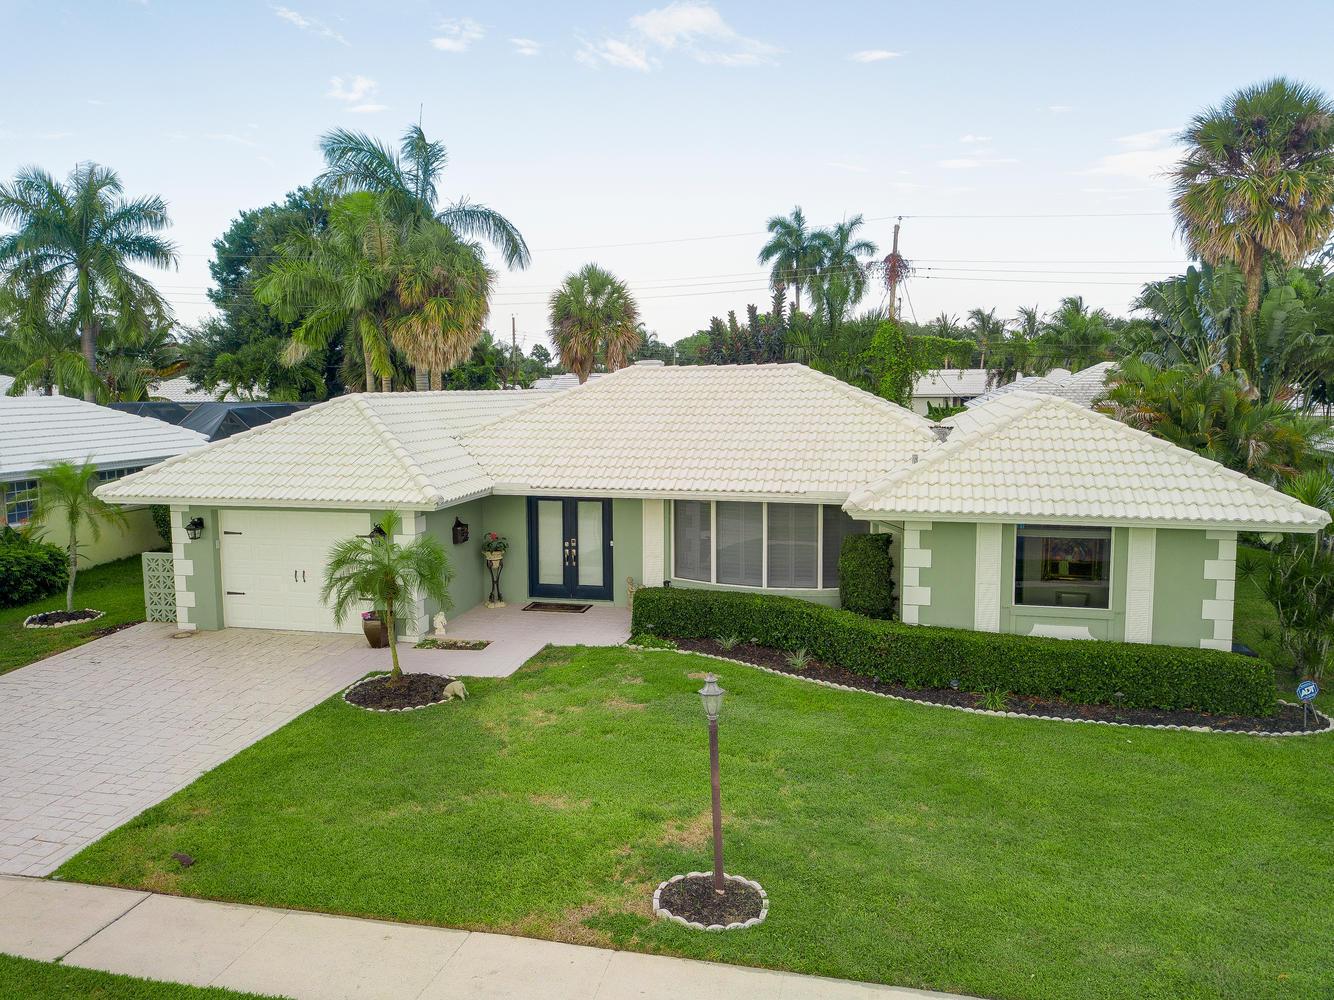 1060 Sw Pepperridge Terrace Boca Raton, FL 33486